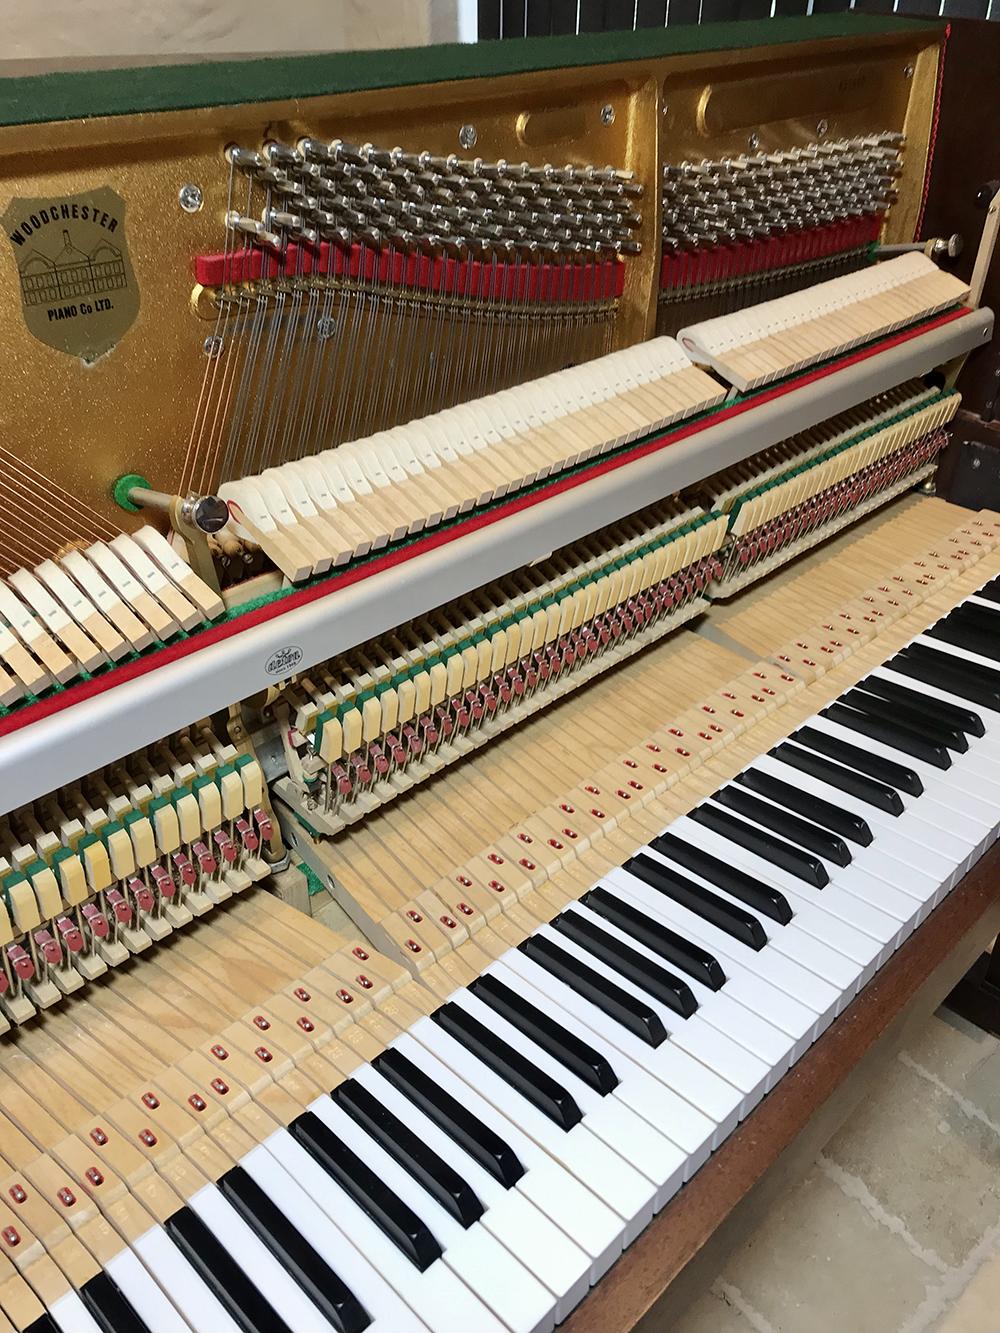 woodchester-upright-used-Piano-Dorset-1.jpg